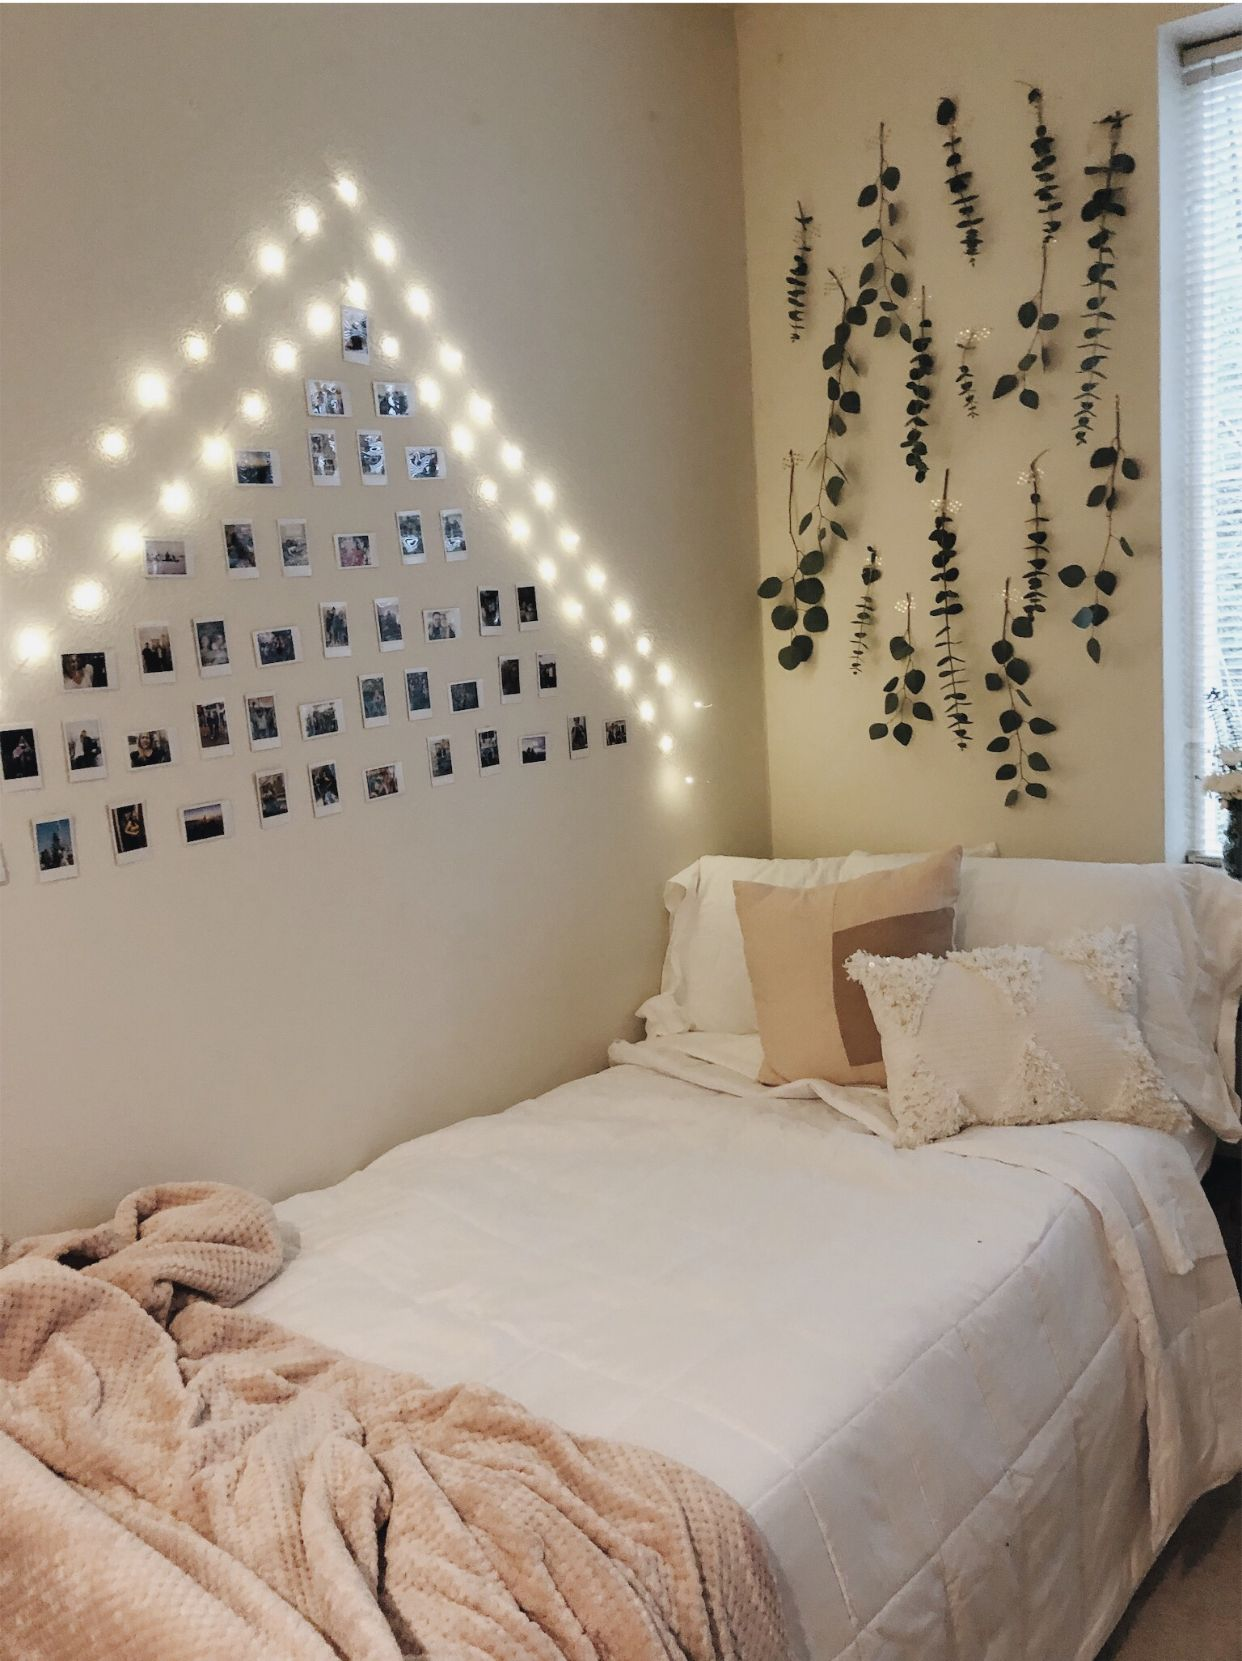 Aesthetic Dorm Room: Aesthetic Room Decor, Dorm Room Designs, Room Decor